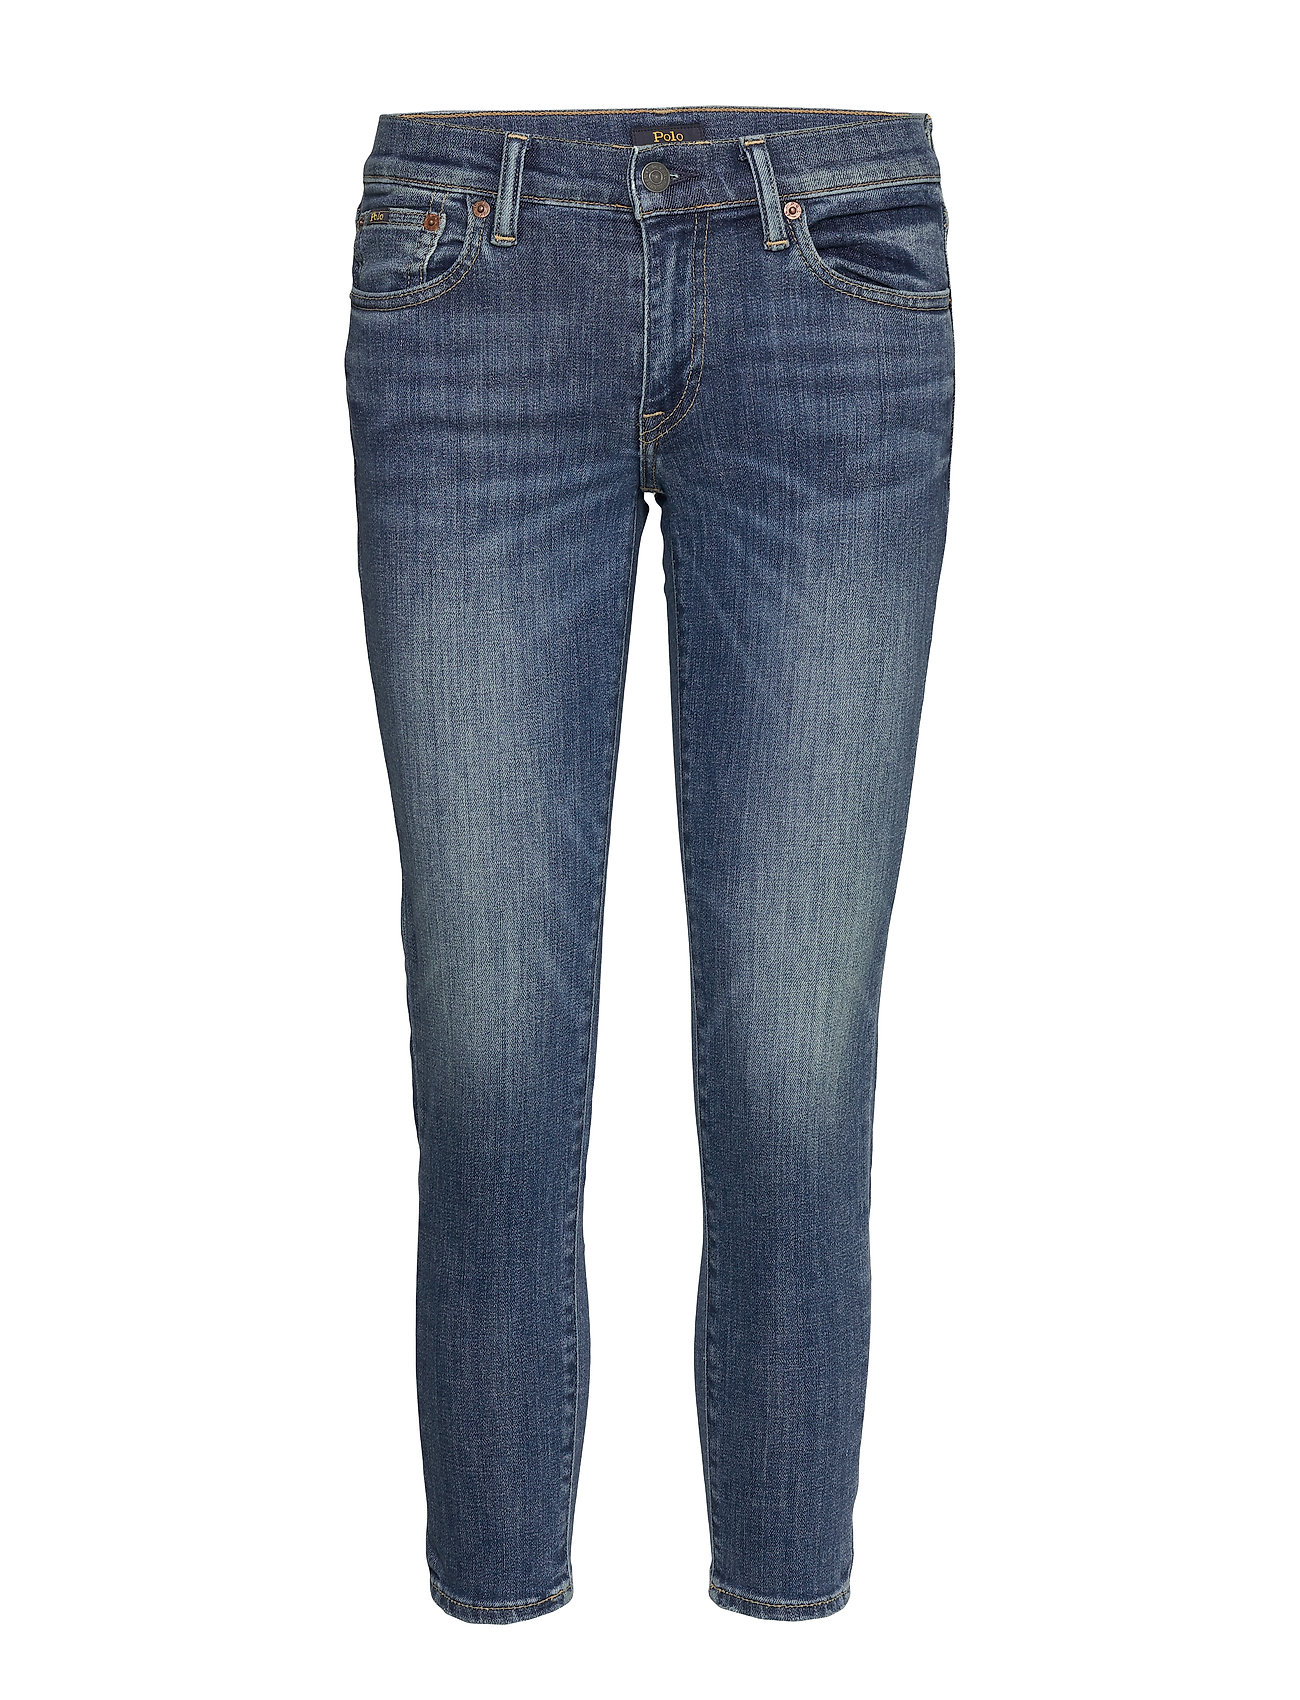 Polo Ralph Lauren Tompkins Skinny Crop Jean - MEDIUM INDIGO